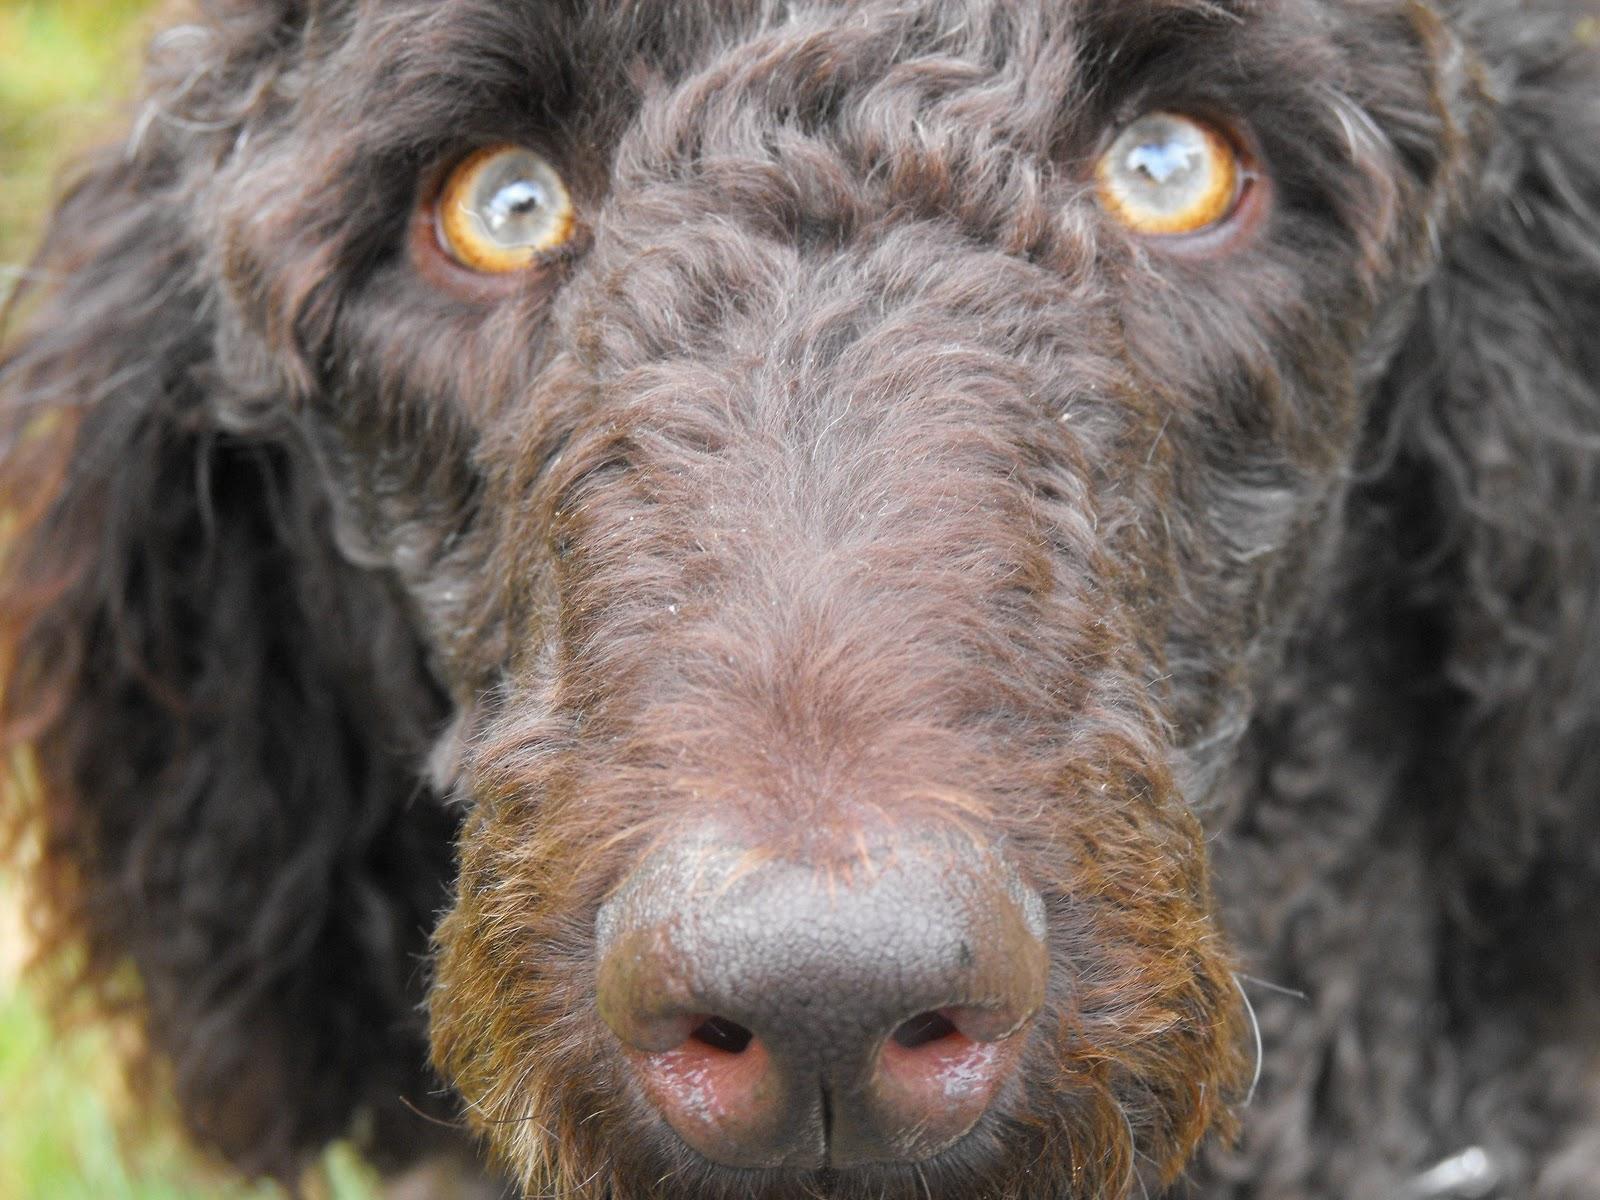 Sad Puppy Dog Eyes Begging Wallpaper Desktop HD